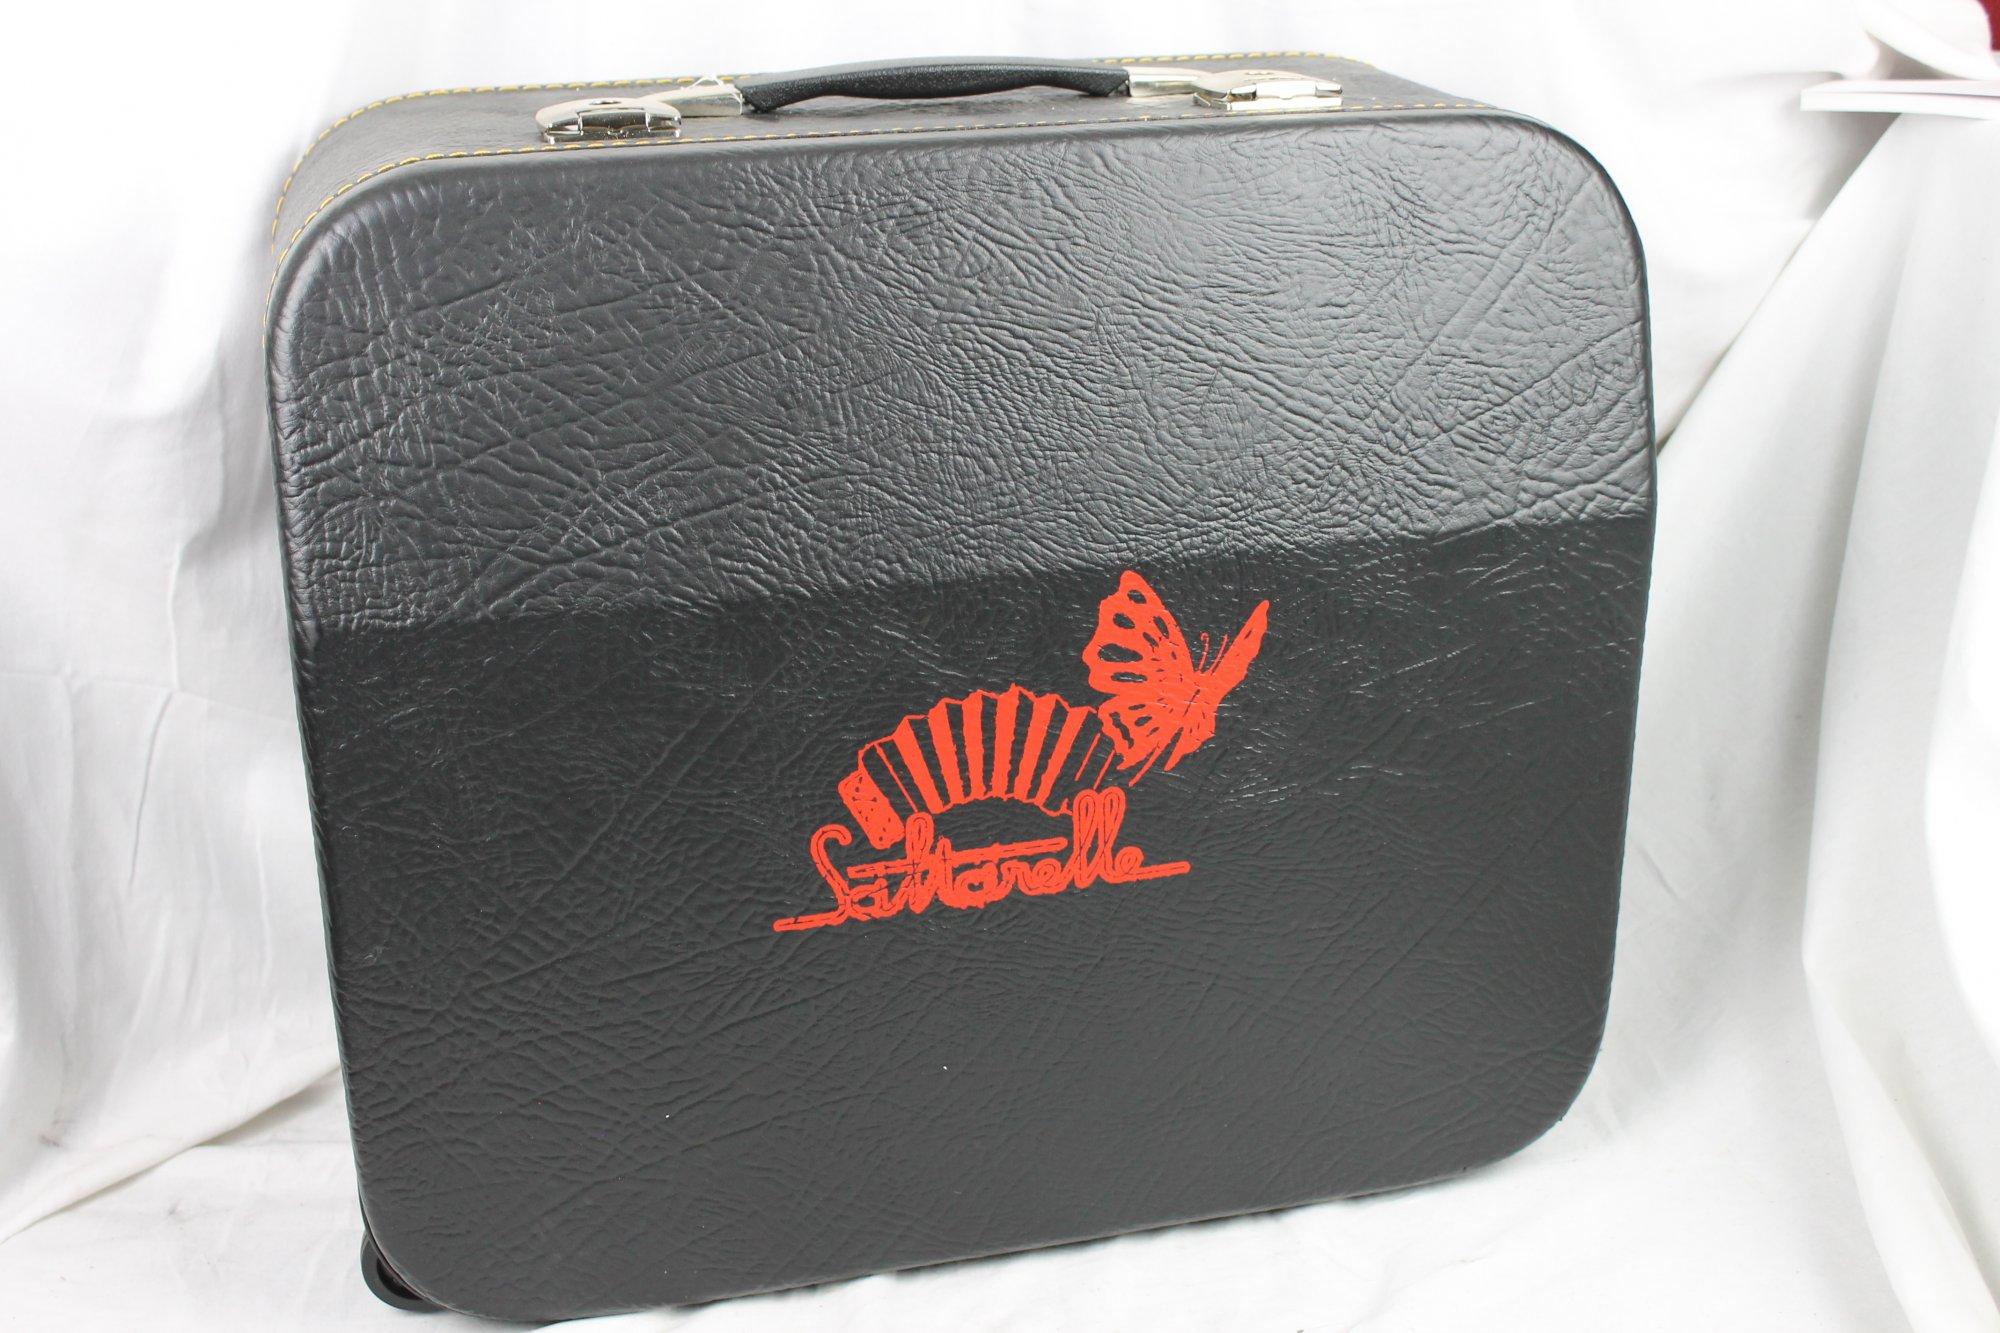 NEW Black Saltarelle Trolley Hard Case for Accordion 20.25 x 17.5 x 9.25 fits Roland FR-4X FR-3X